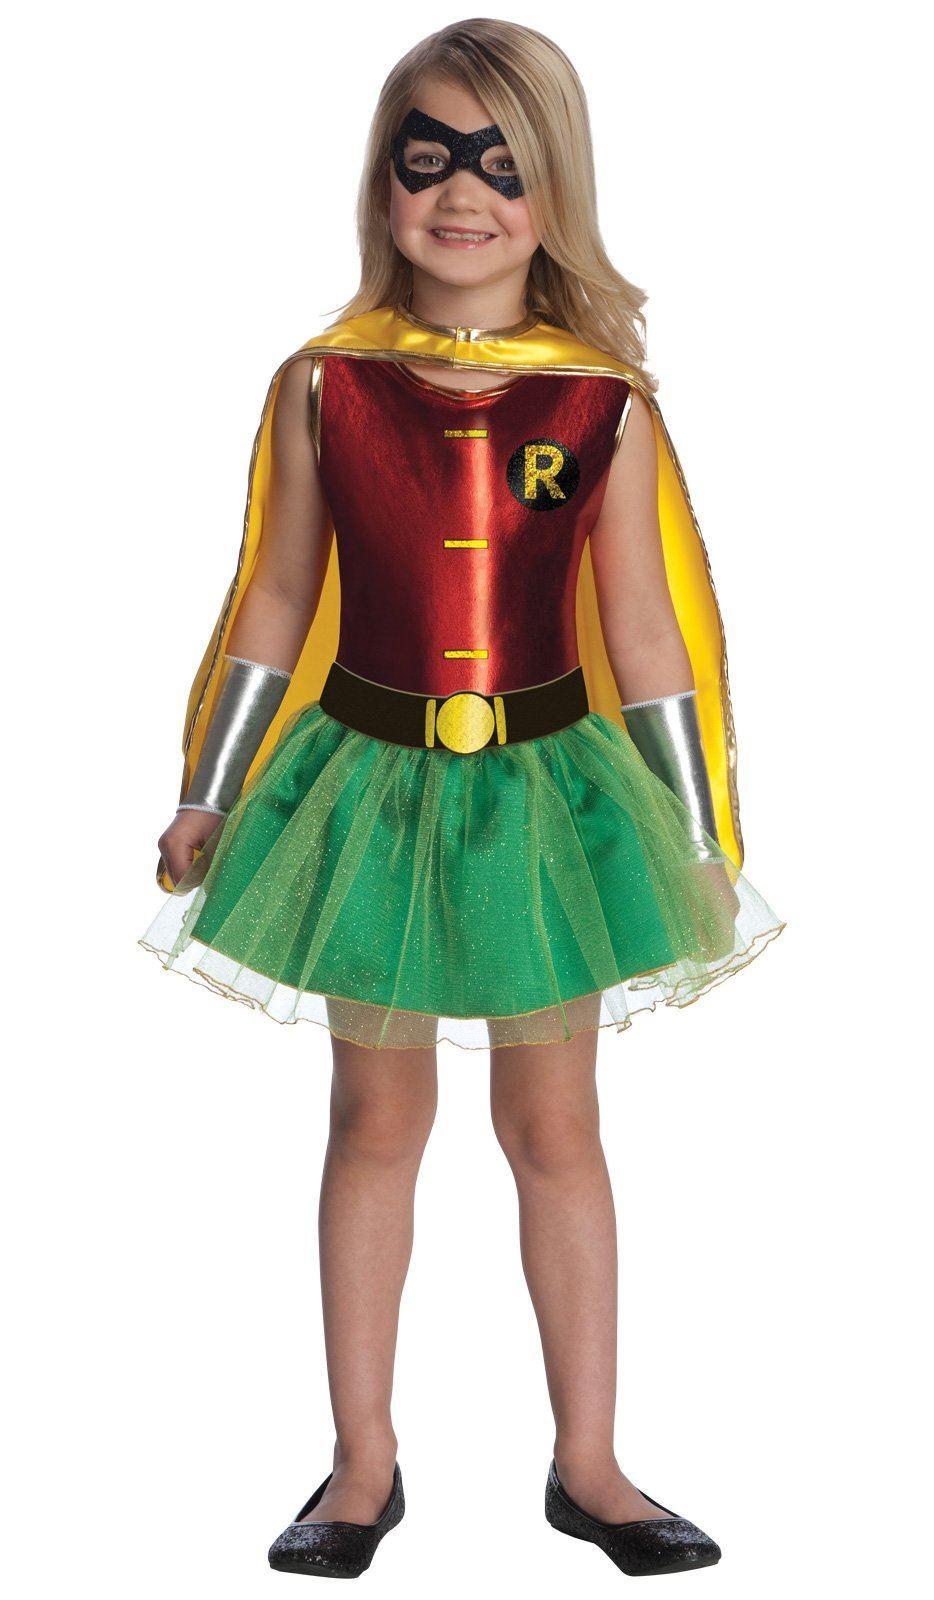 robin tutu girl halloween costume the costume land. Black Bedroom Furniture Sets. Home Design Ideas